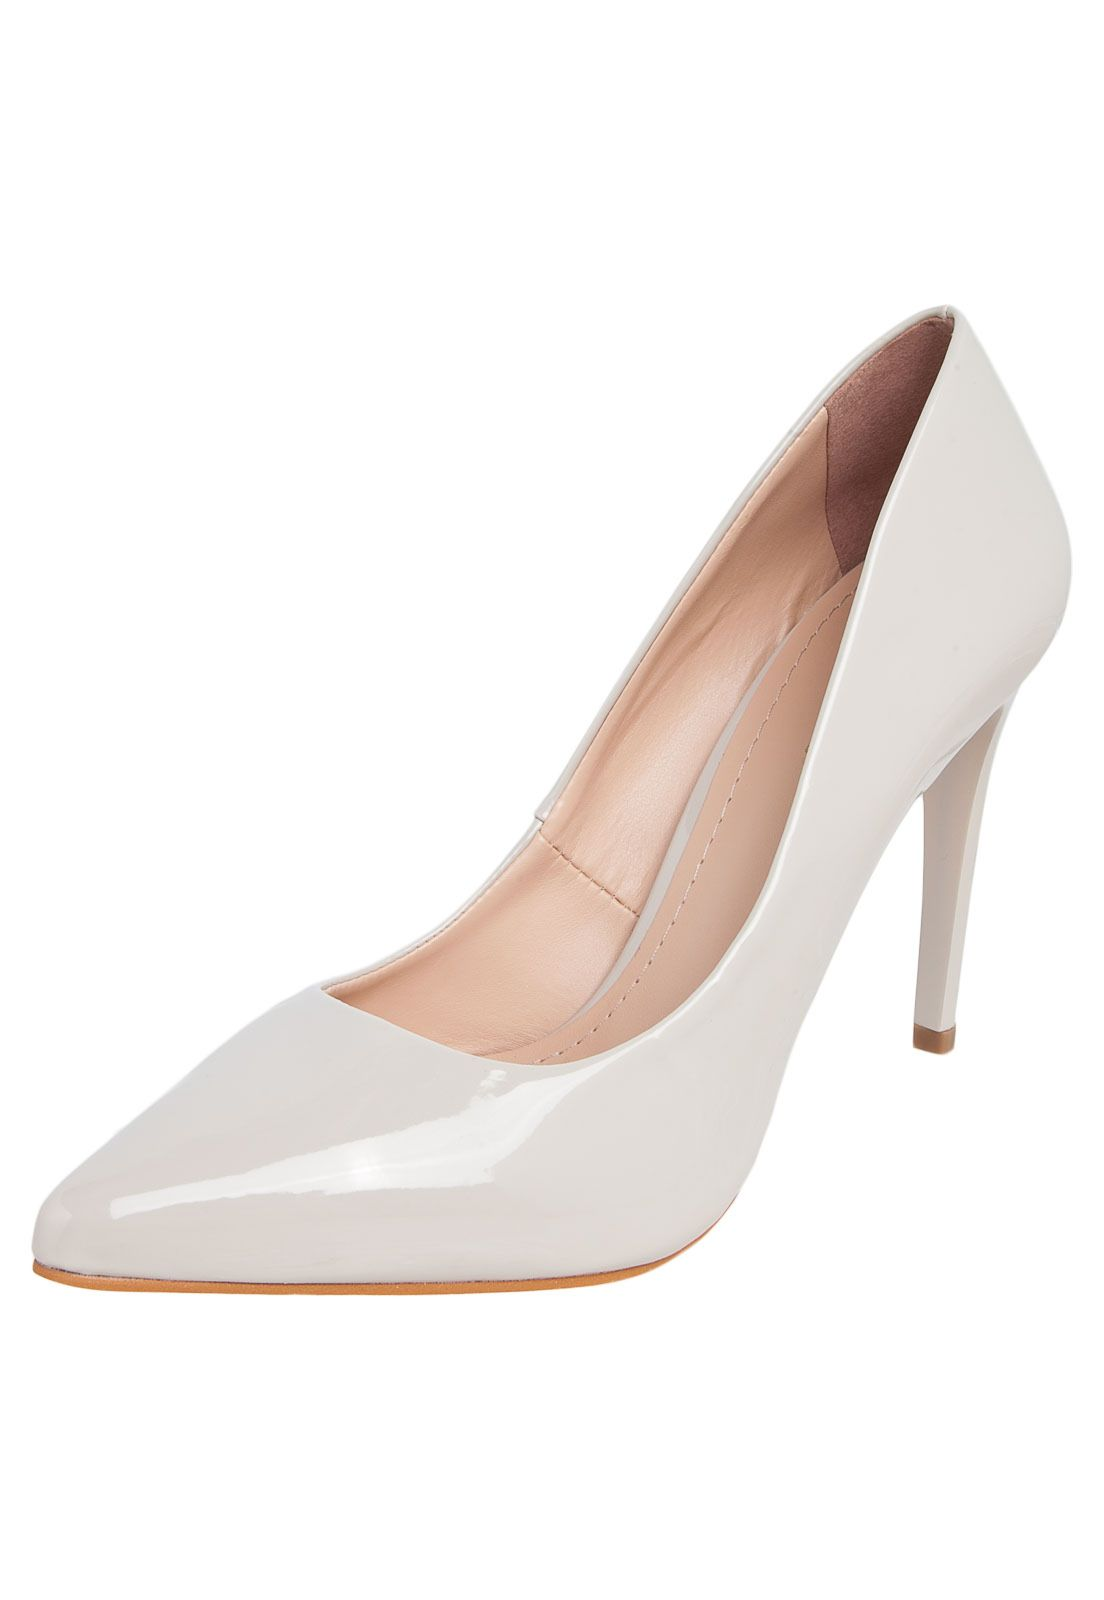 a232c5239 Scarpin DAFITI SHOES Bege   CASAMENTO   Shoes, Heels e Pumps